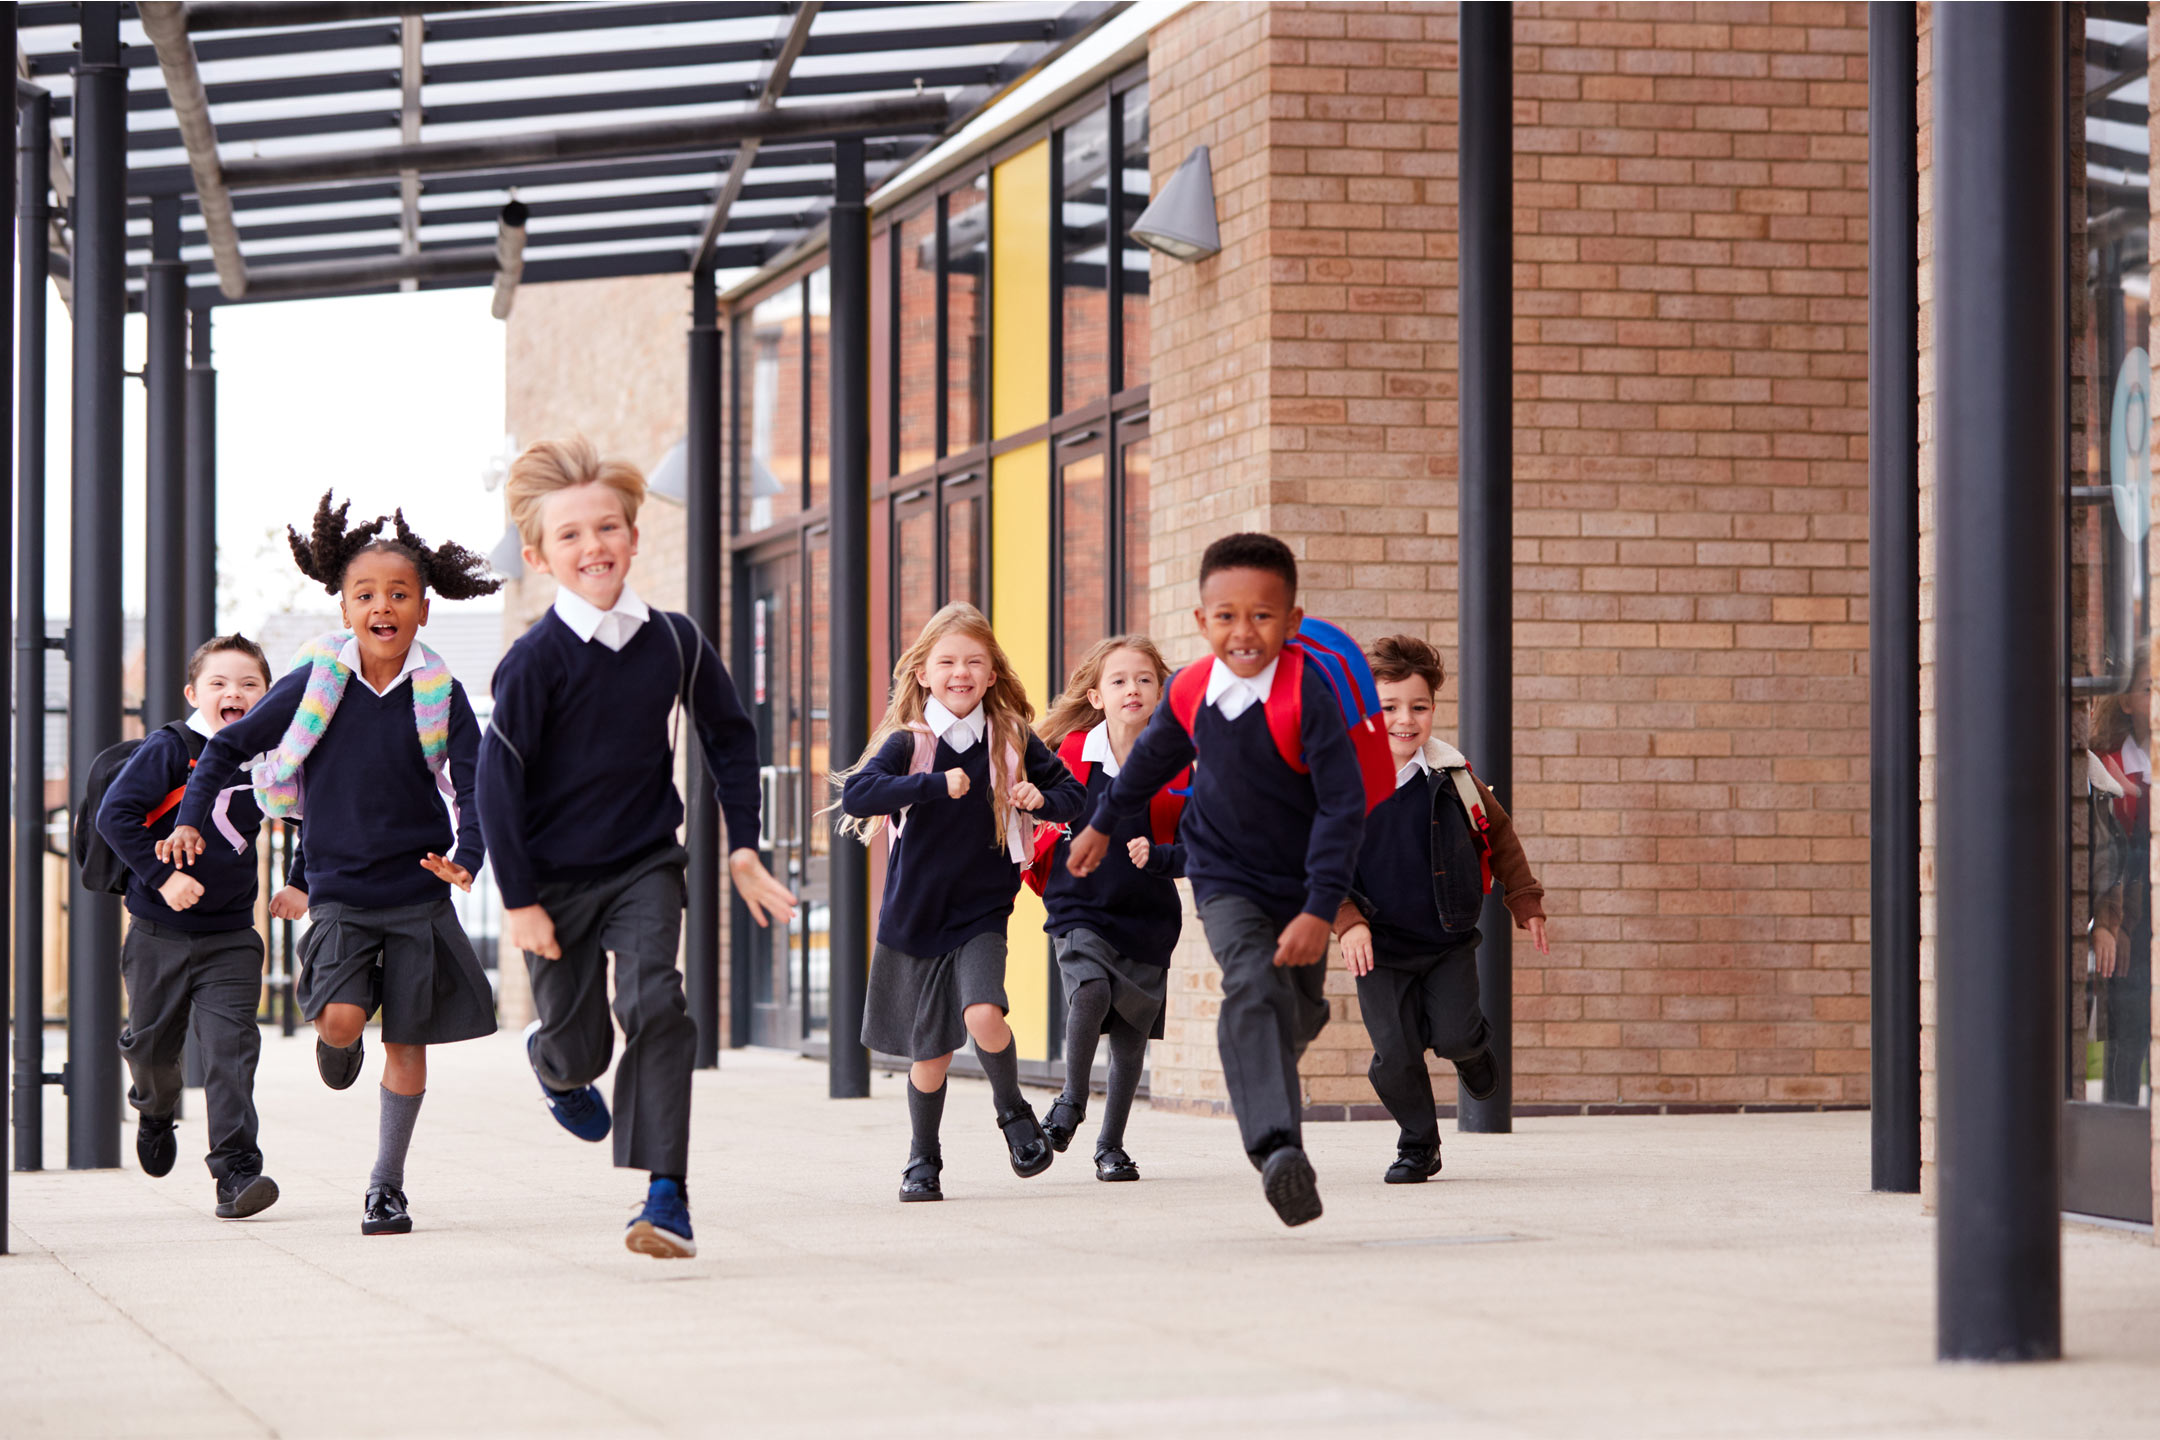 primary-kids-uniform-running2160